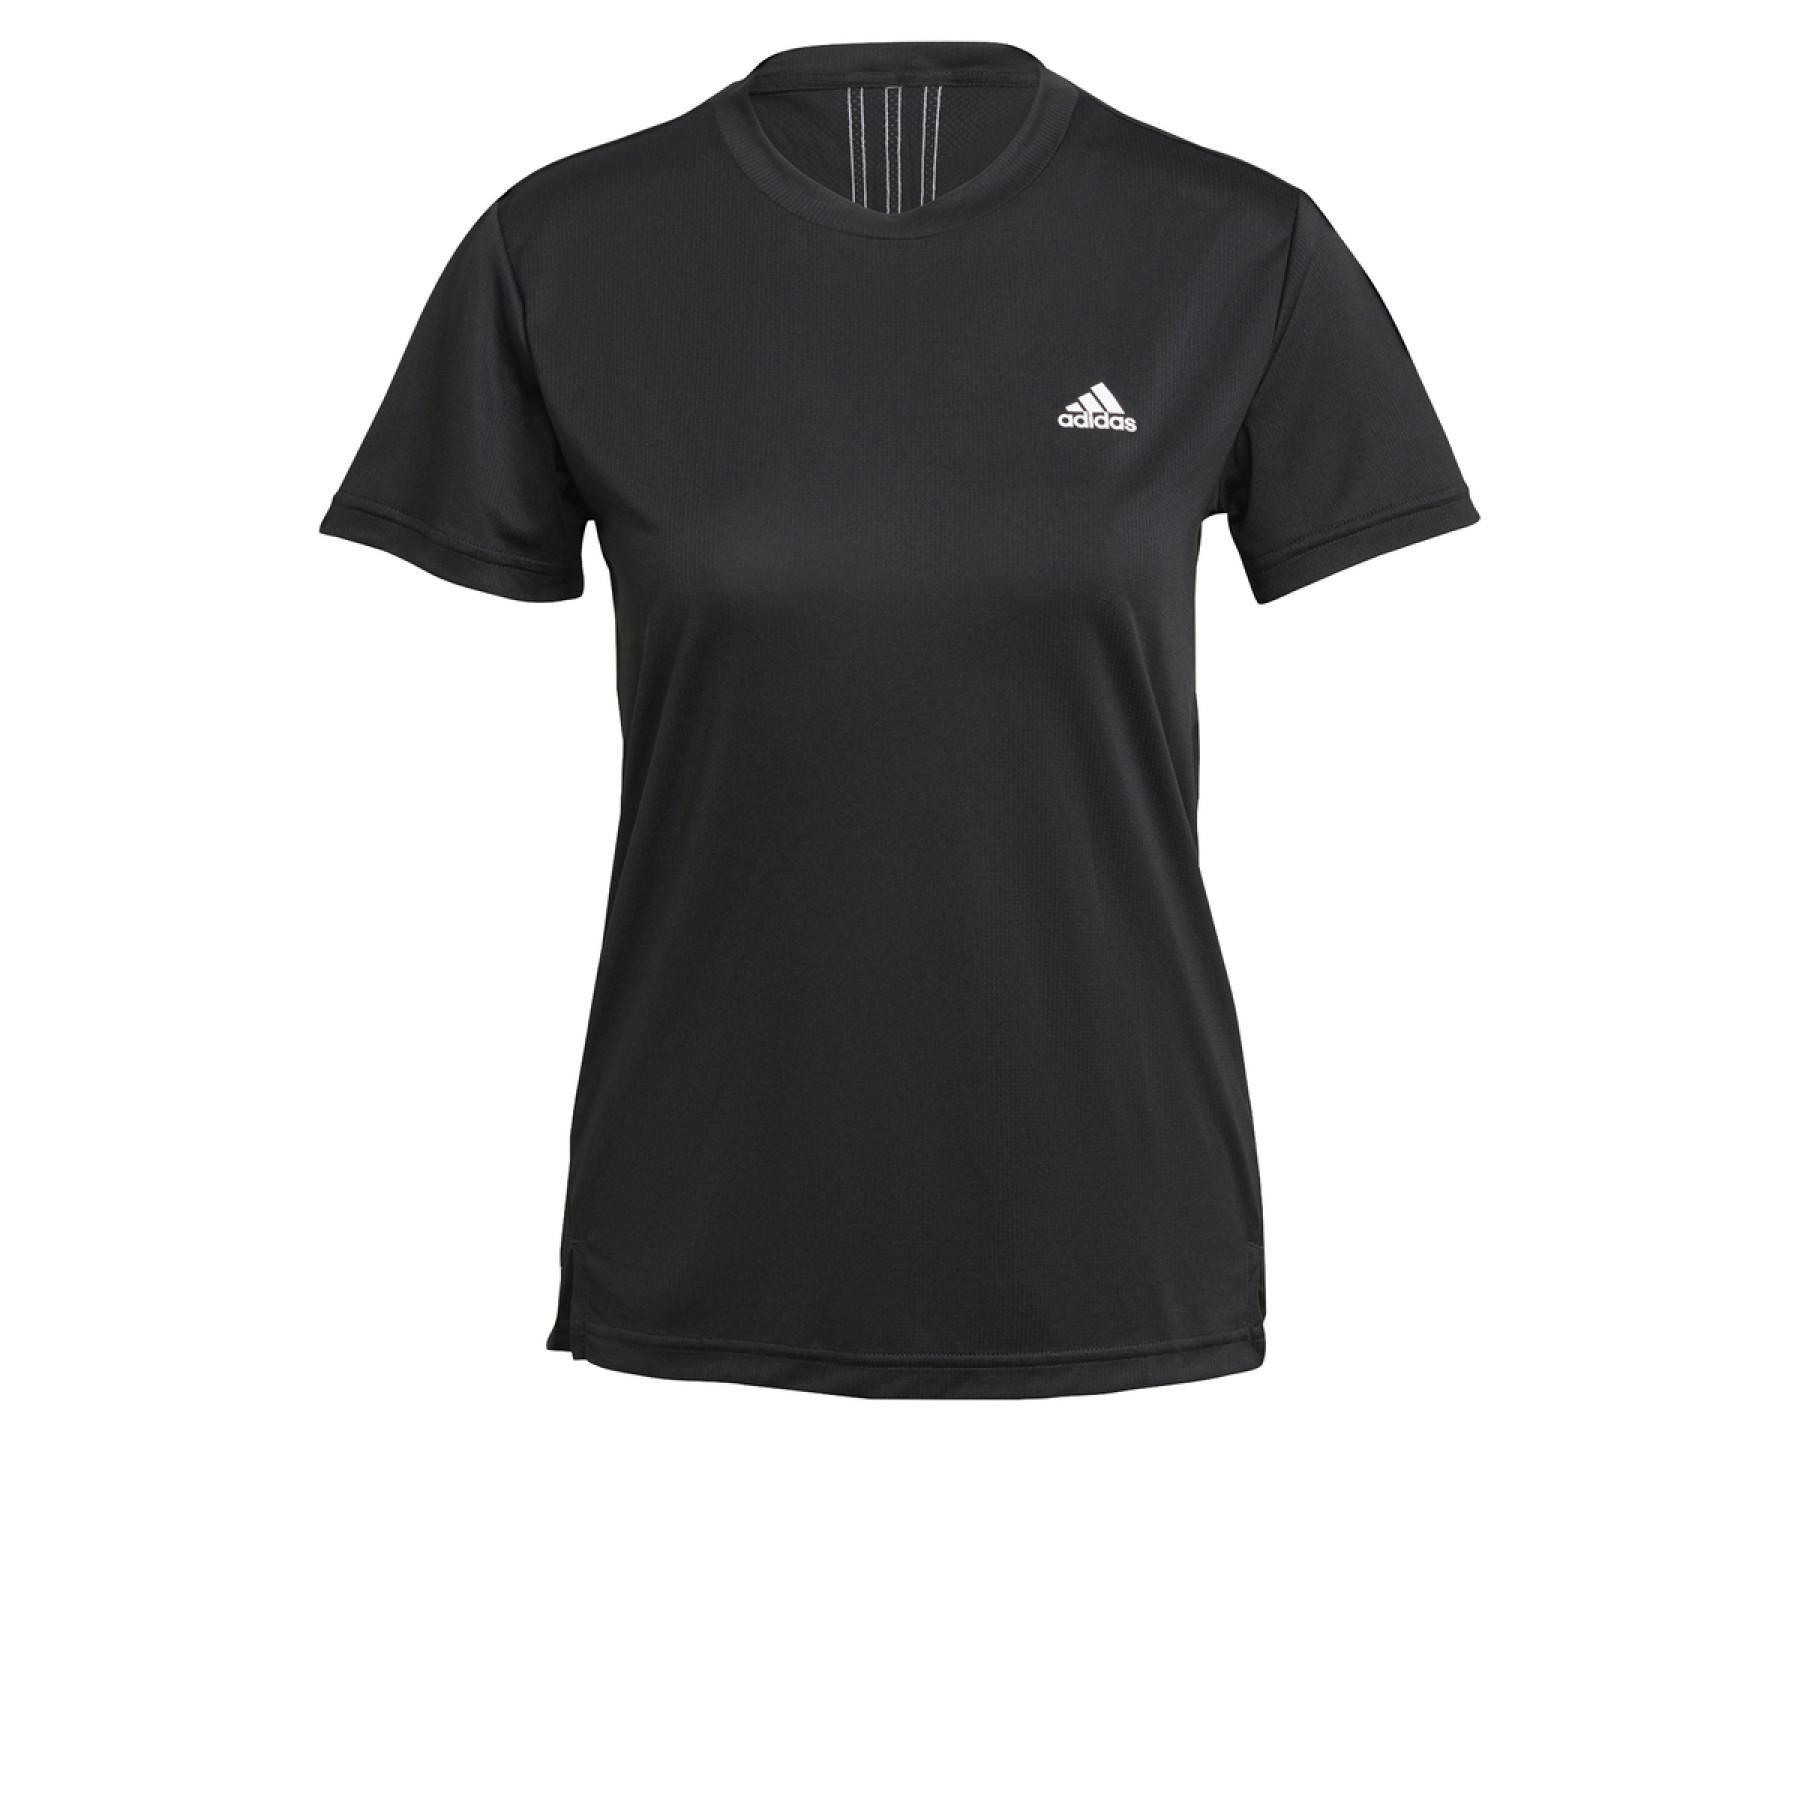 adidas Women's T-Shirt Aeroready Designed 2 Move 3-Stripes Sport